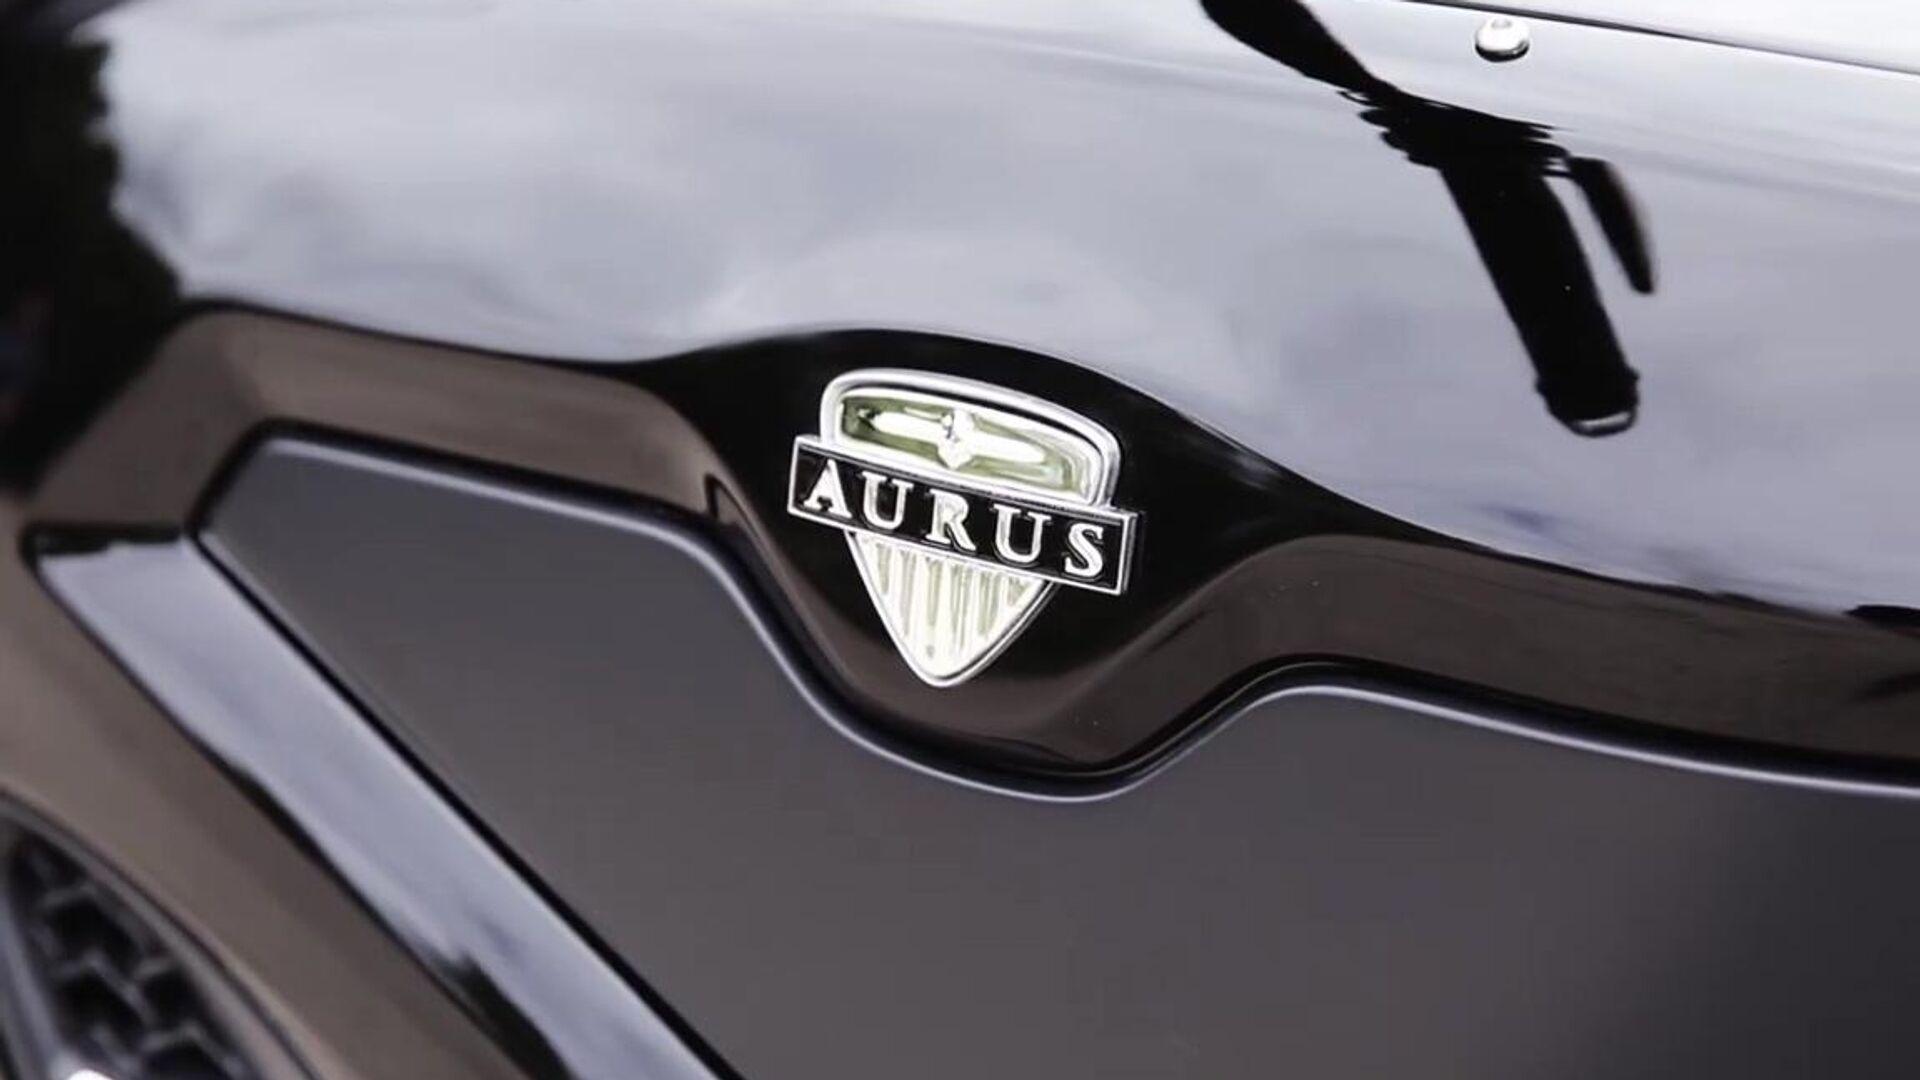 Логотип на прототипе электрического мотоцикла специального назначения Aurus - РИА Новости, 1920, 03.06.2021